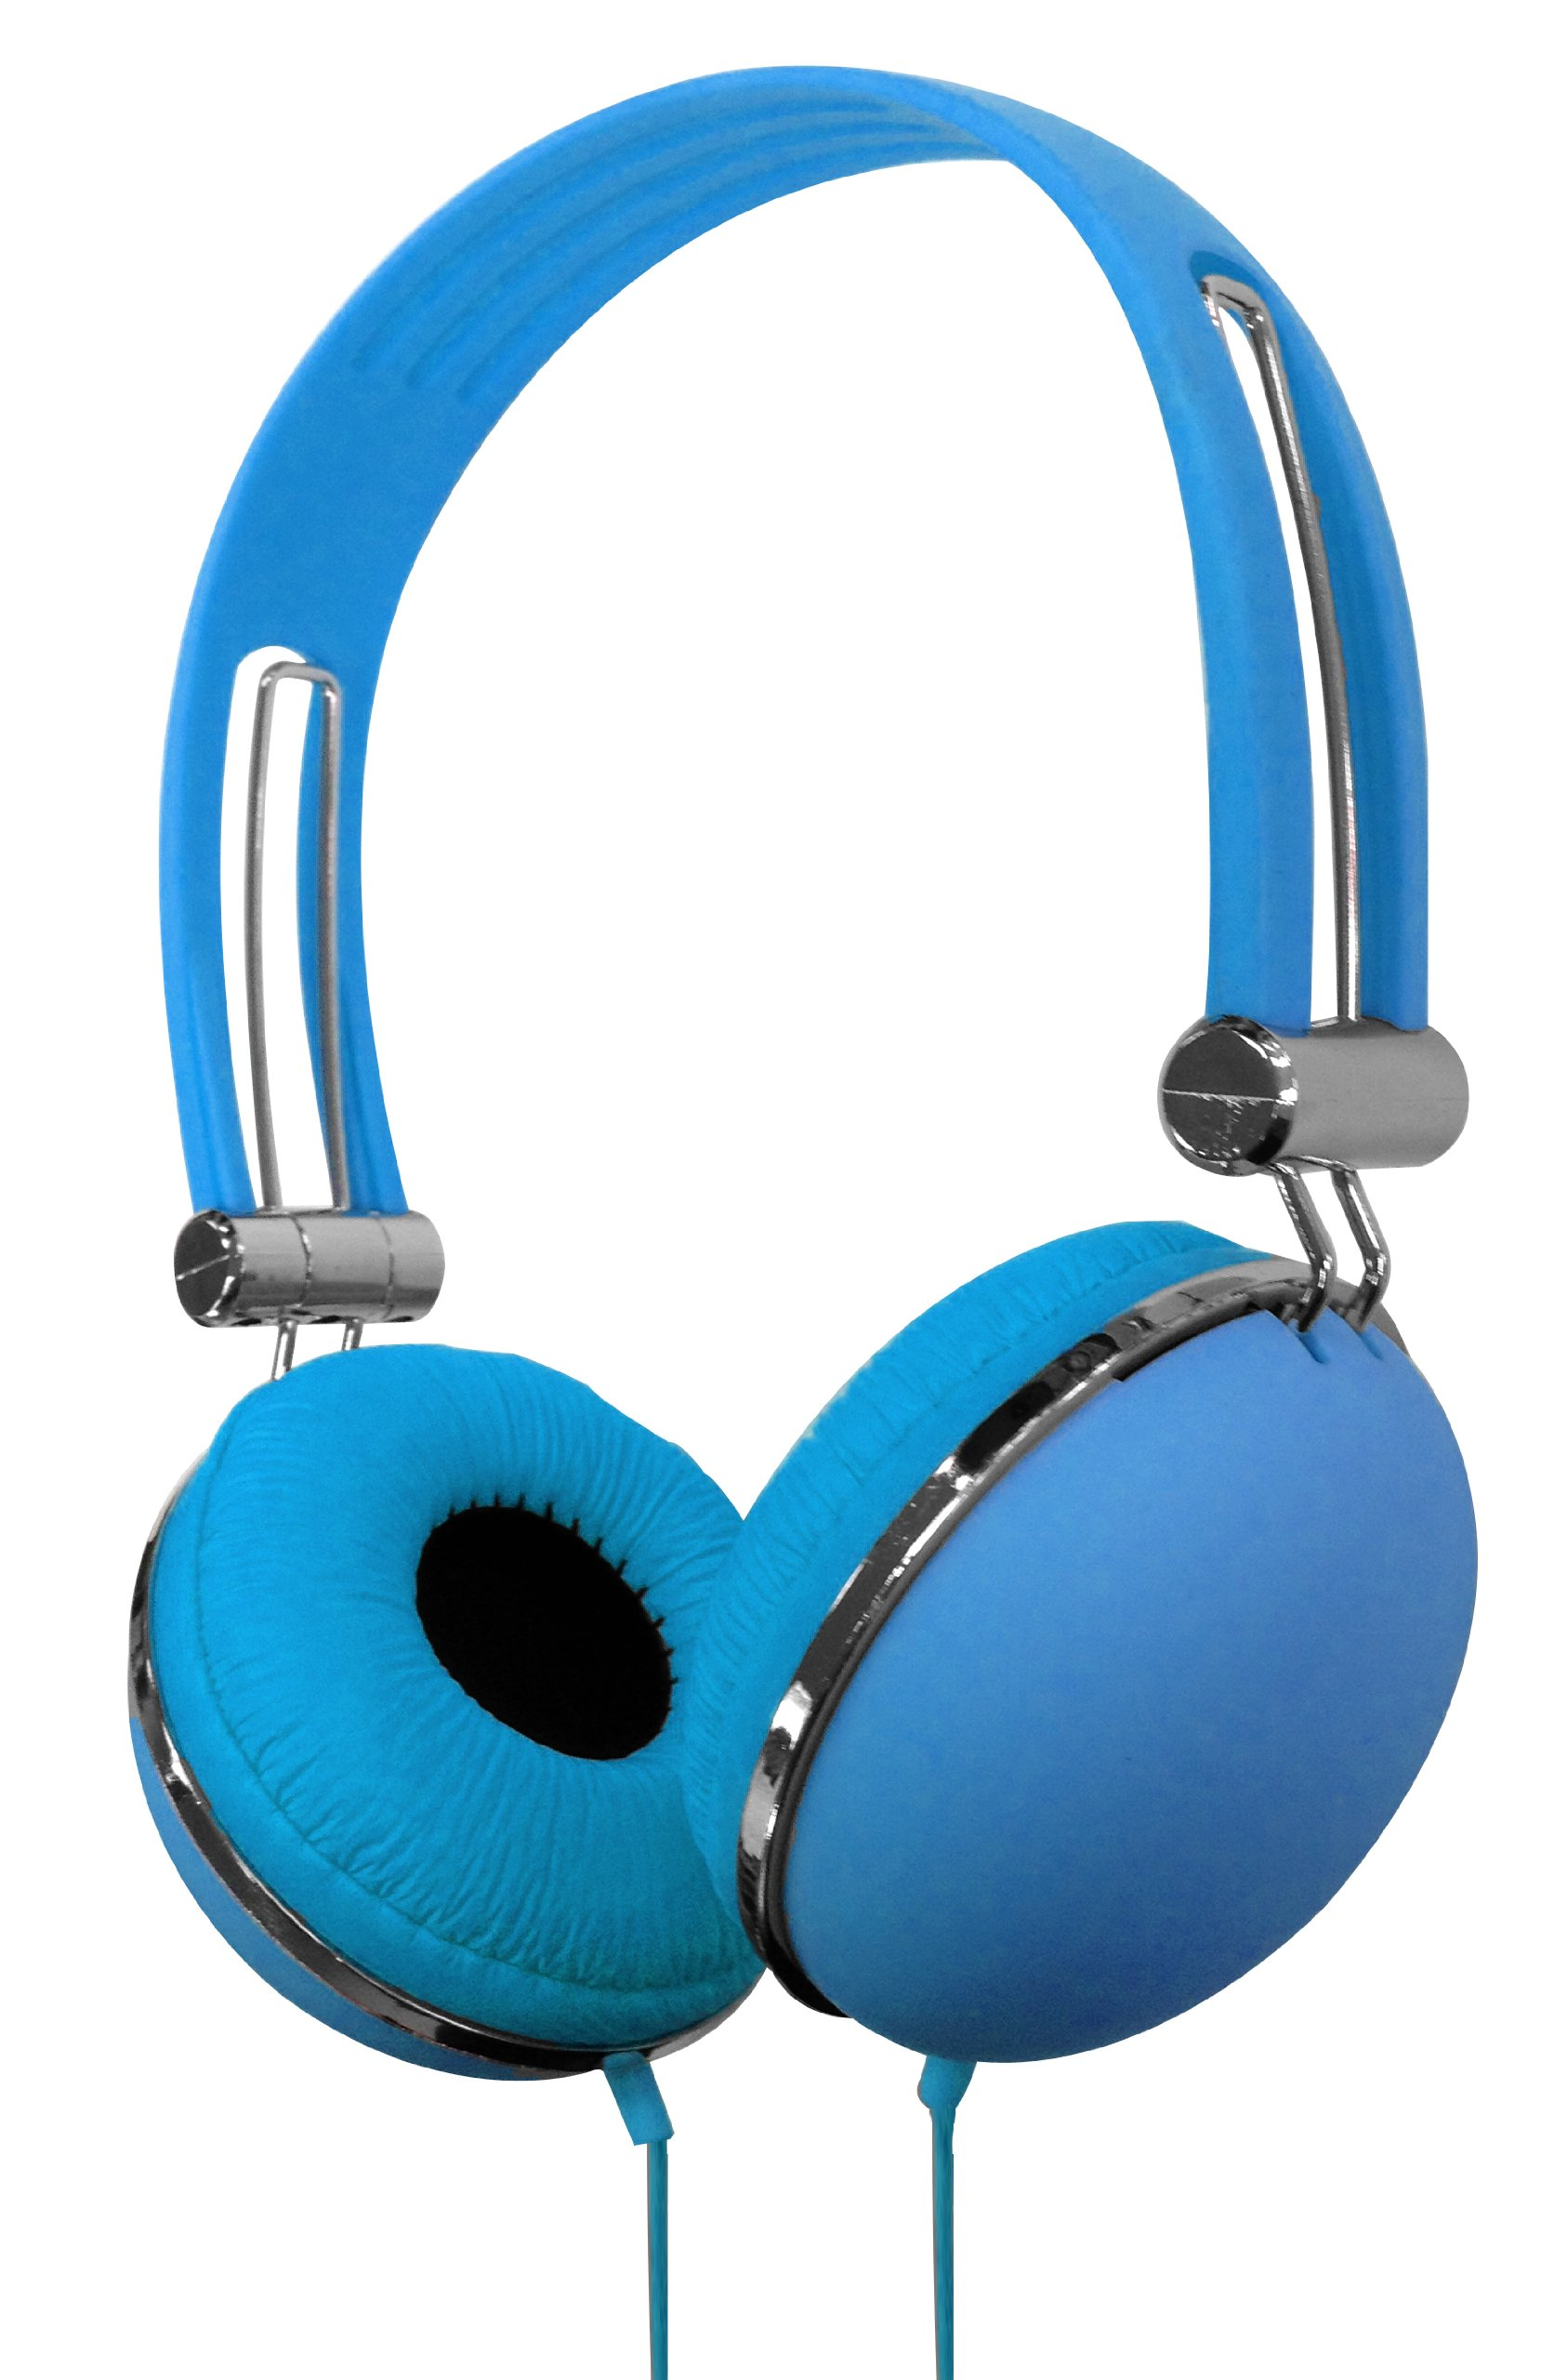 VIBE VS-830-DJ-BLU Soft Touch Headphones by Vibe